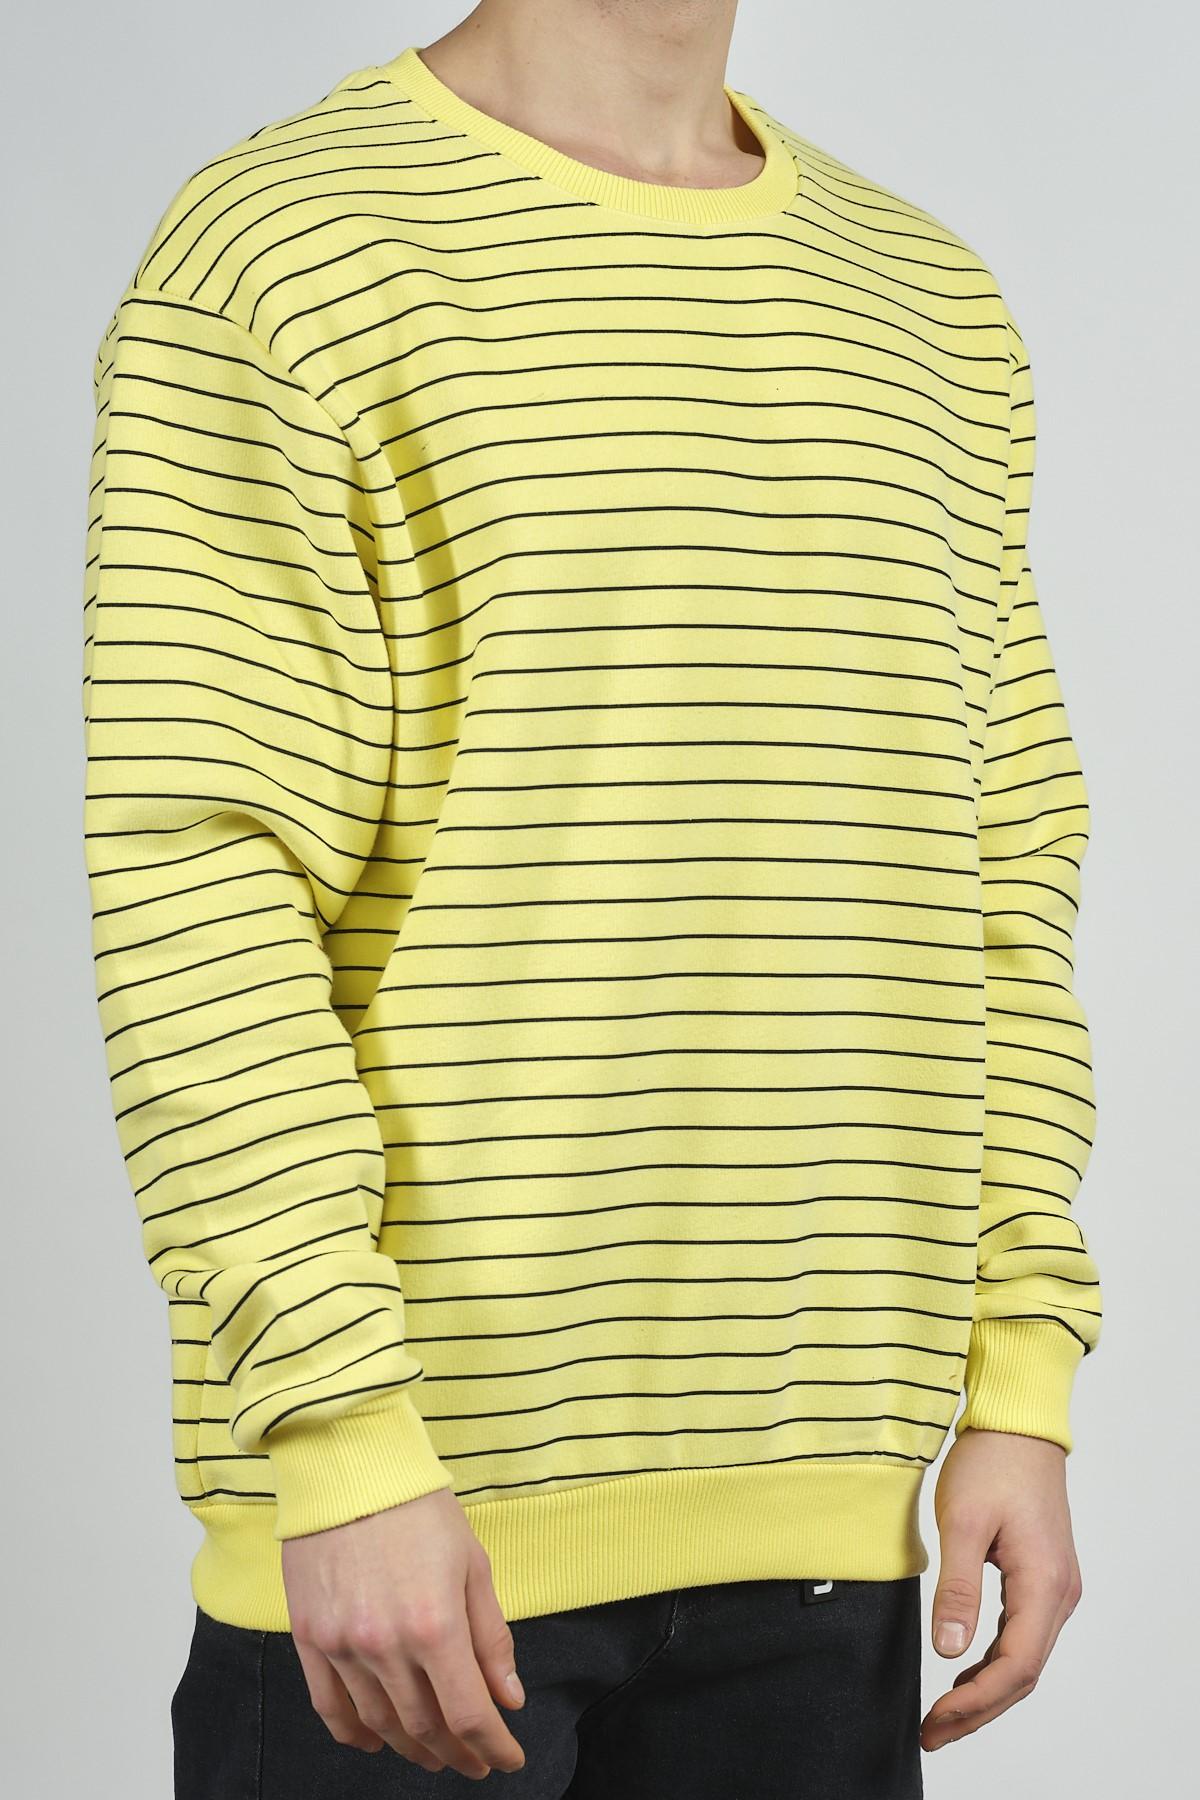 - Sarı Çizgili Sweatsihrt 1KXE8-44272-10